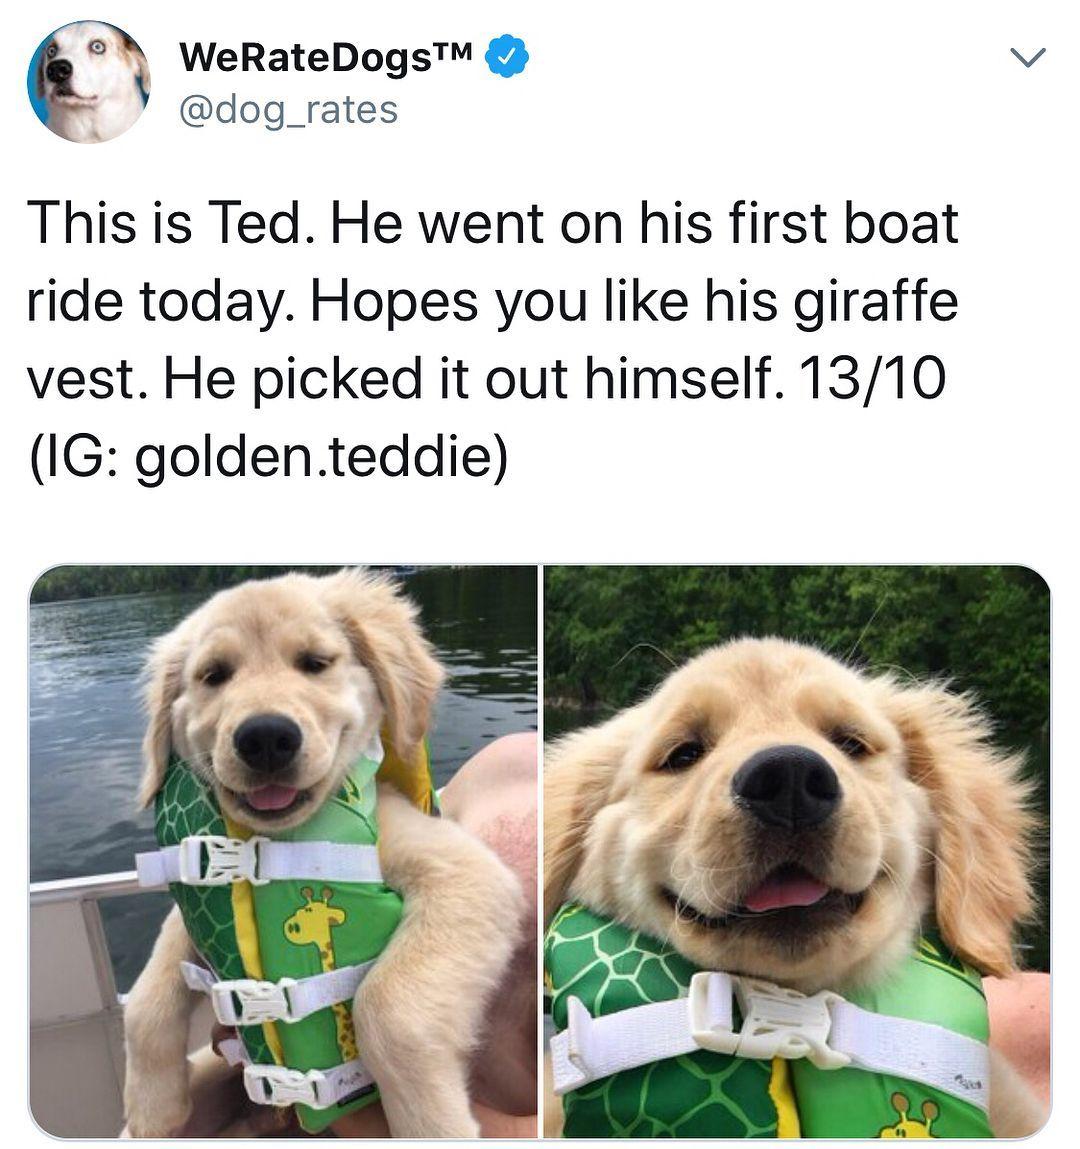 Dog Memes For The Win Dog Doggo Doggy Dogmeme Dogmemes Moredogs Dogs Funny Fun Humor Hi Cute Animals Cute Baby Animals Cute Little Animals